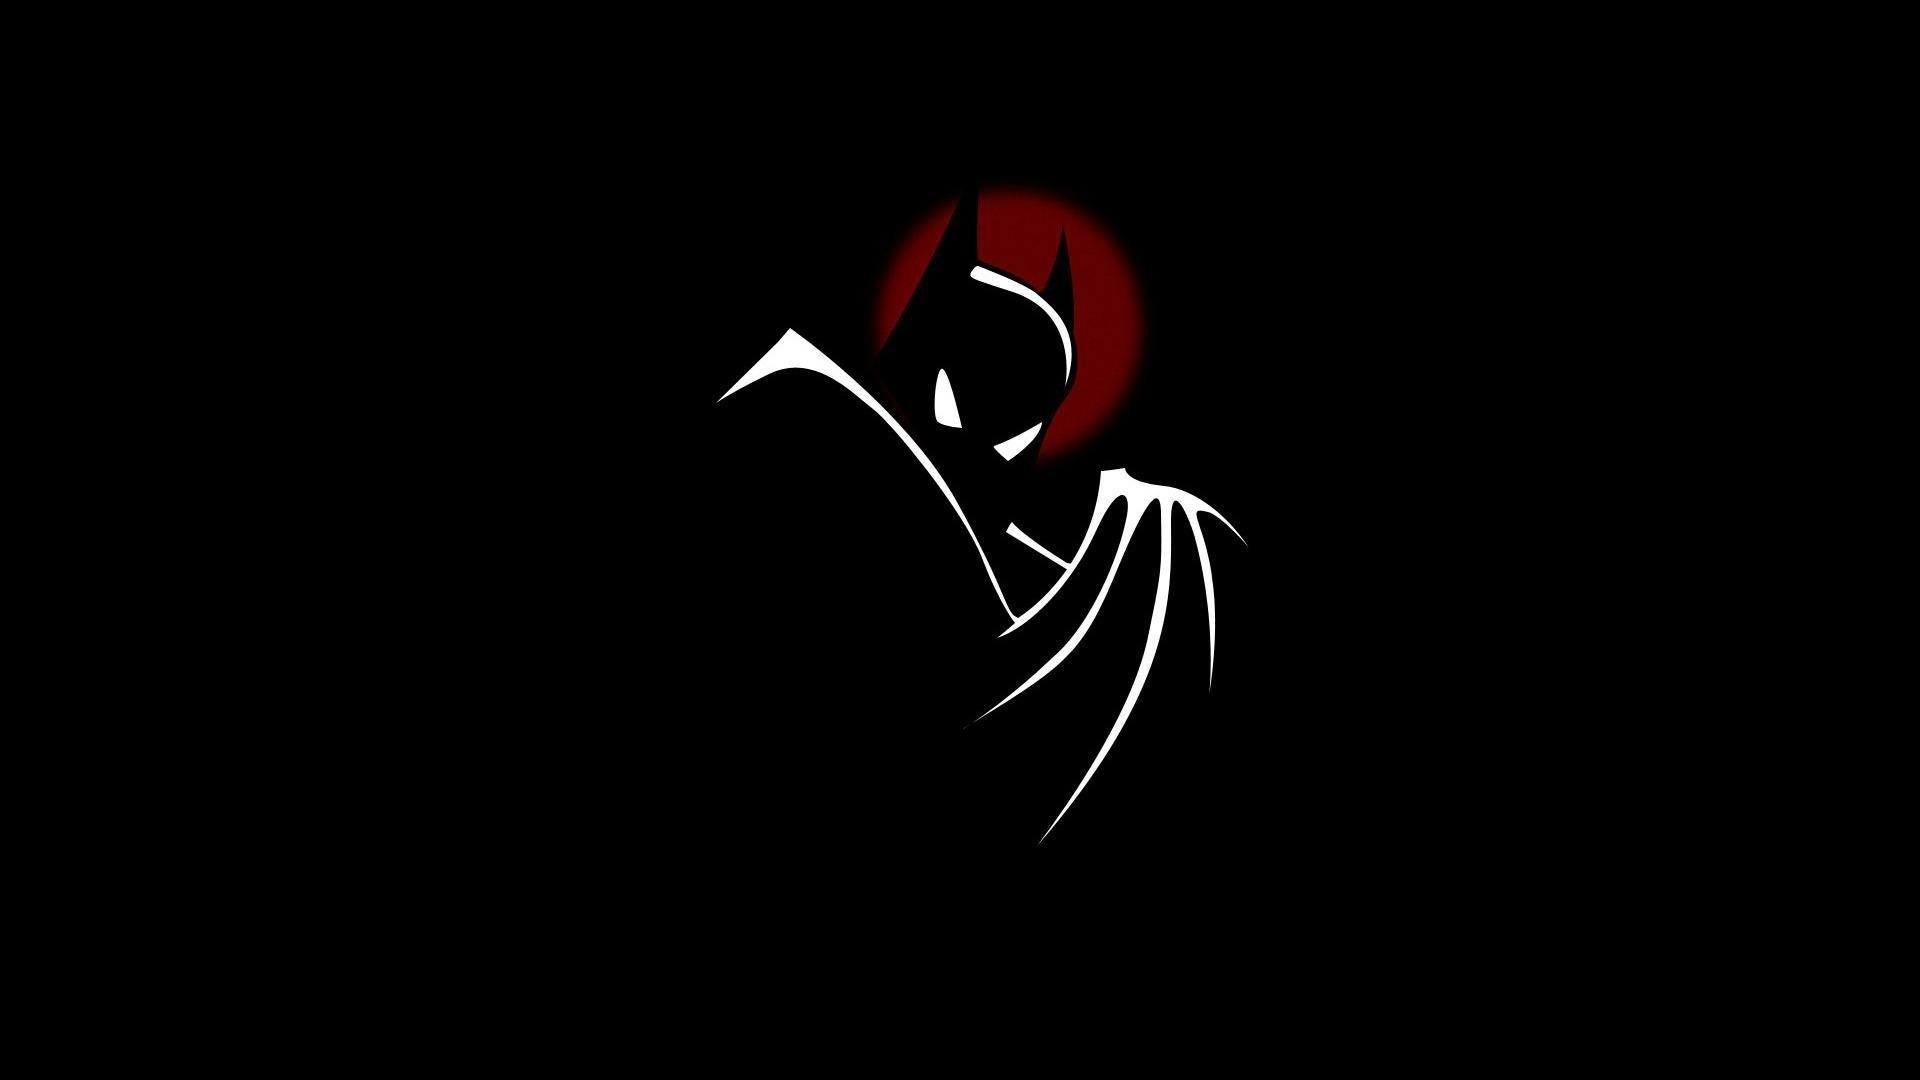 1920x1080 Full HD 1080p Batman Arkham City Wallpapers Desktop